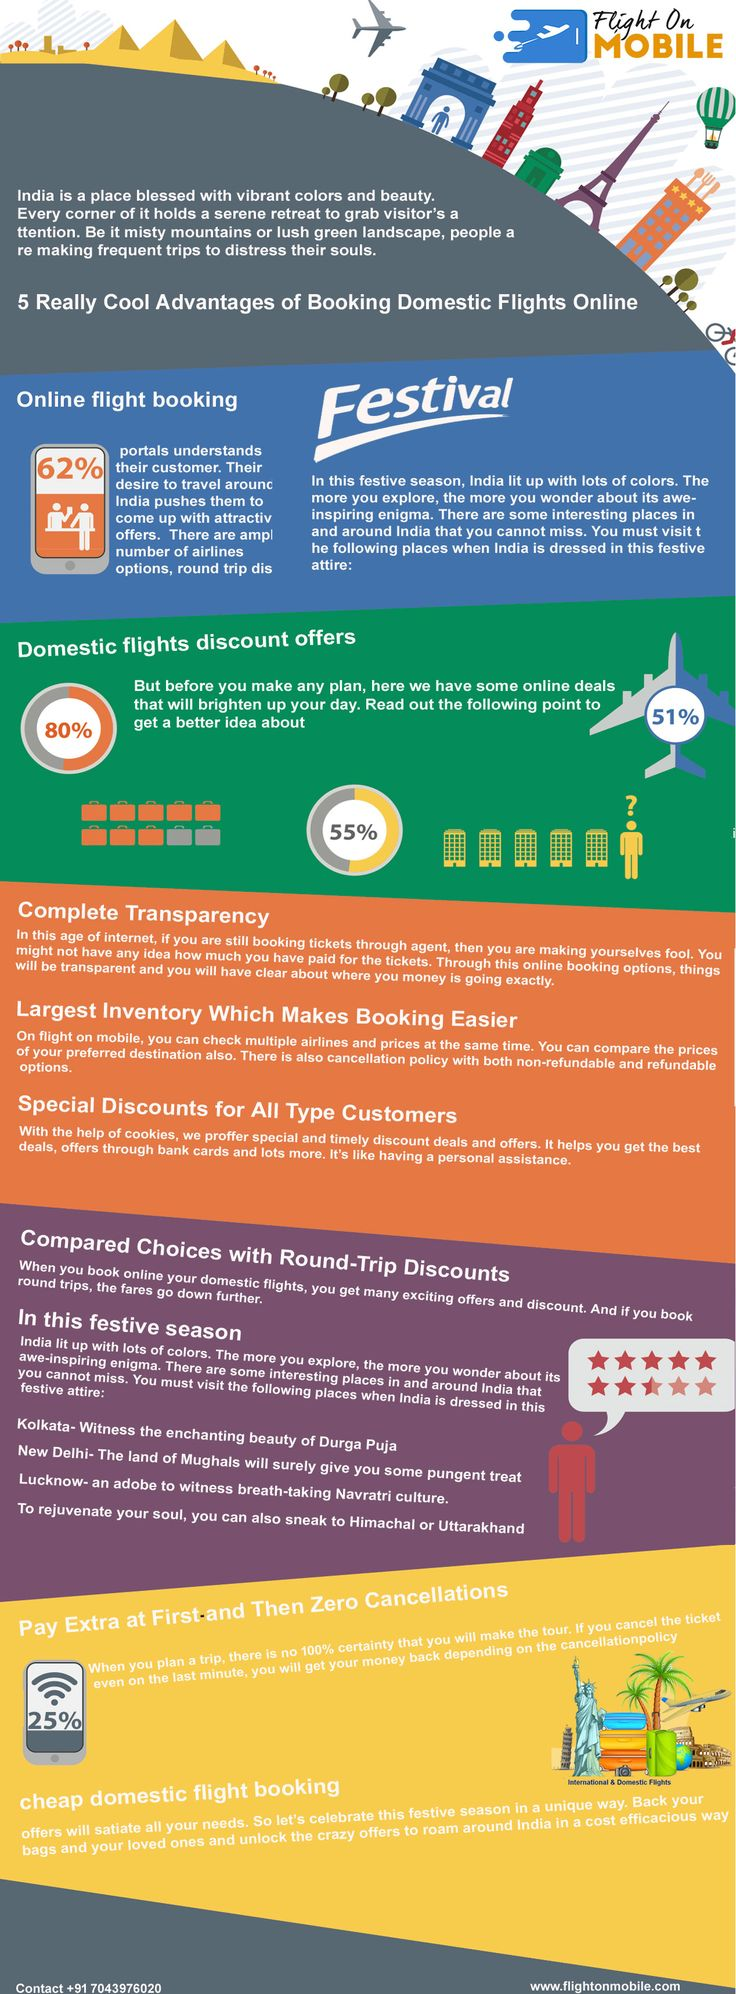 Online_flight_booking_portals understands their customer